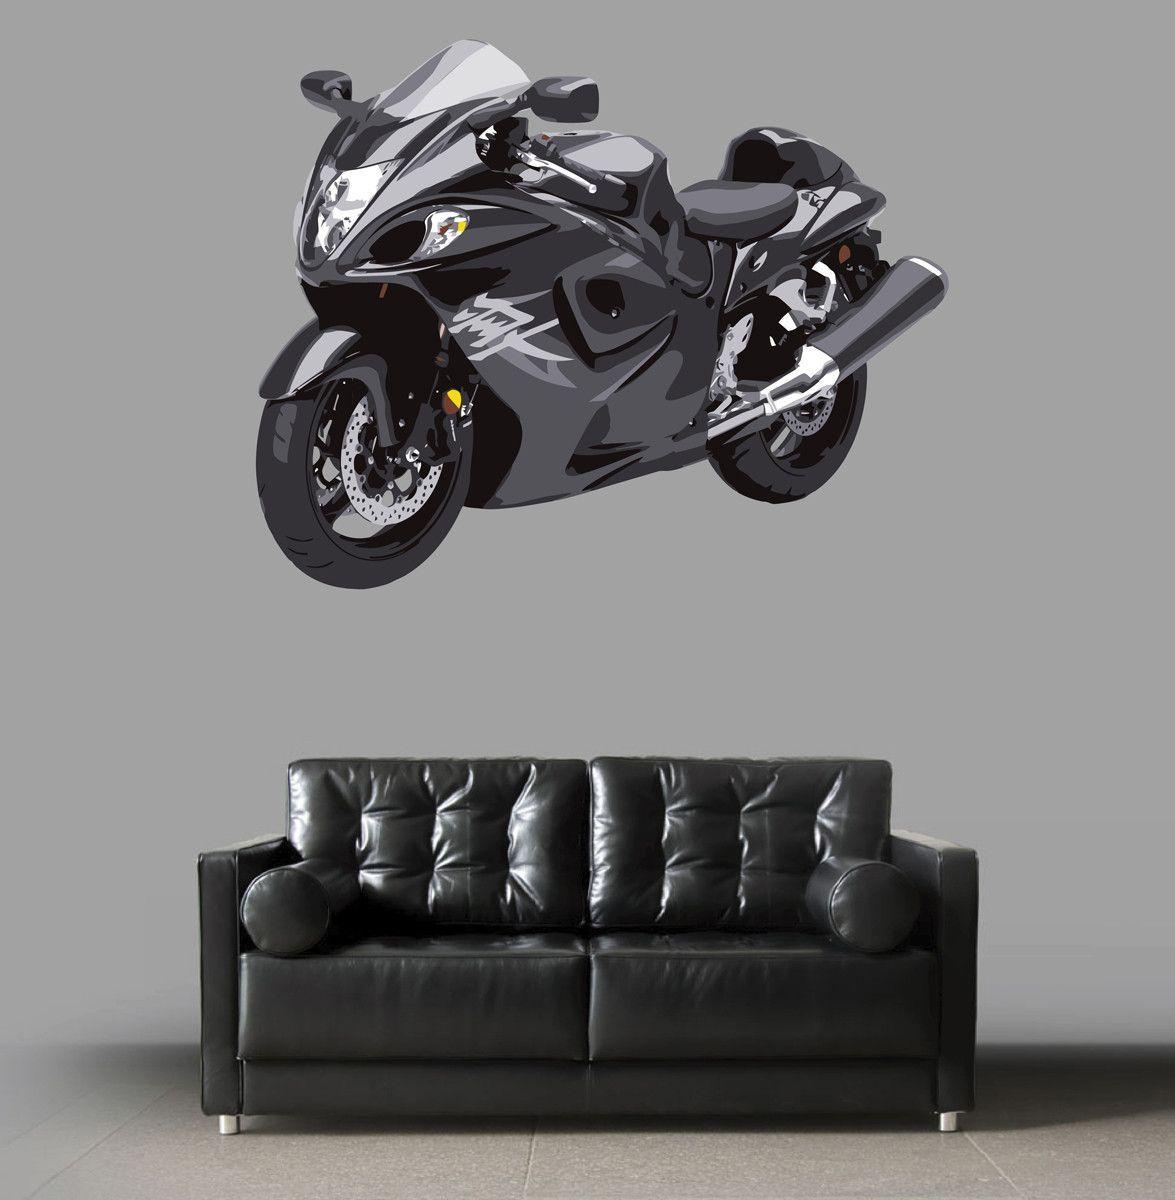 cik58 Full Color Wall decal motorcycle racing speed strength bedroom living room for teens